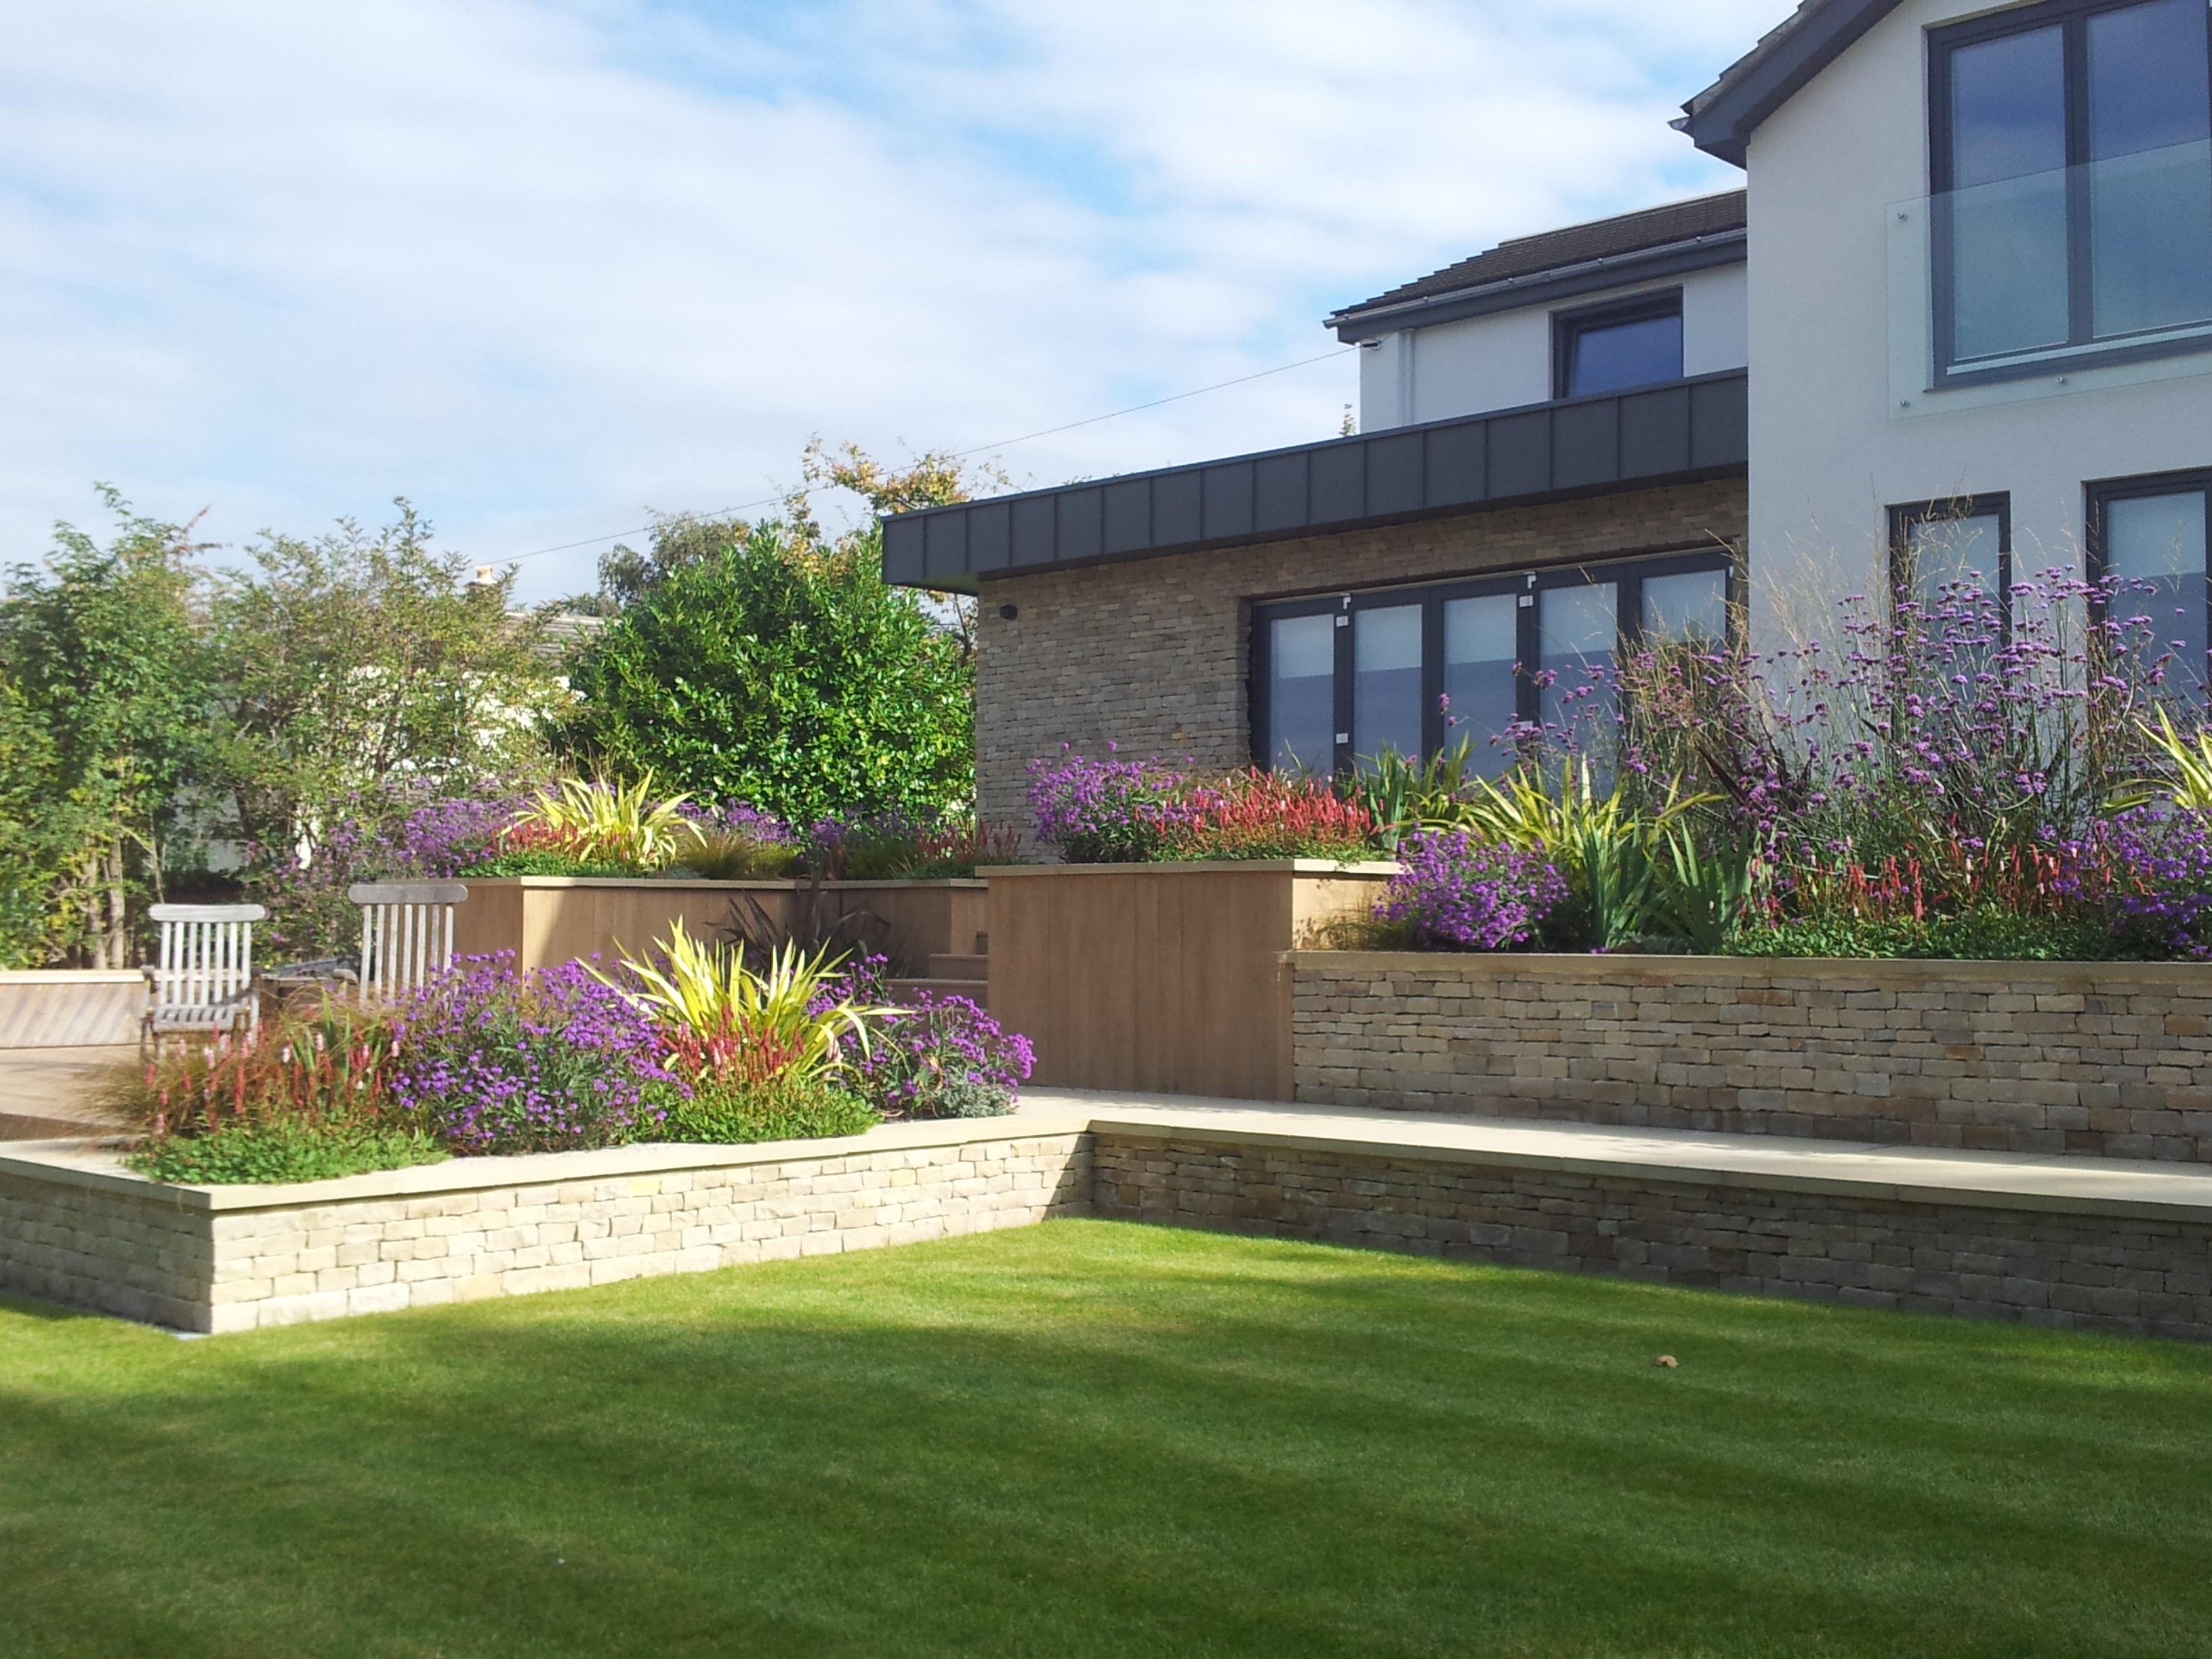 Professional Landscaping Garden Design Services